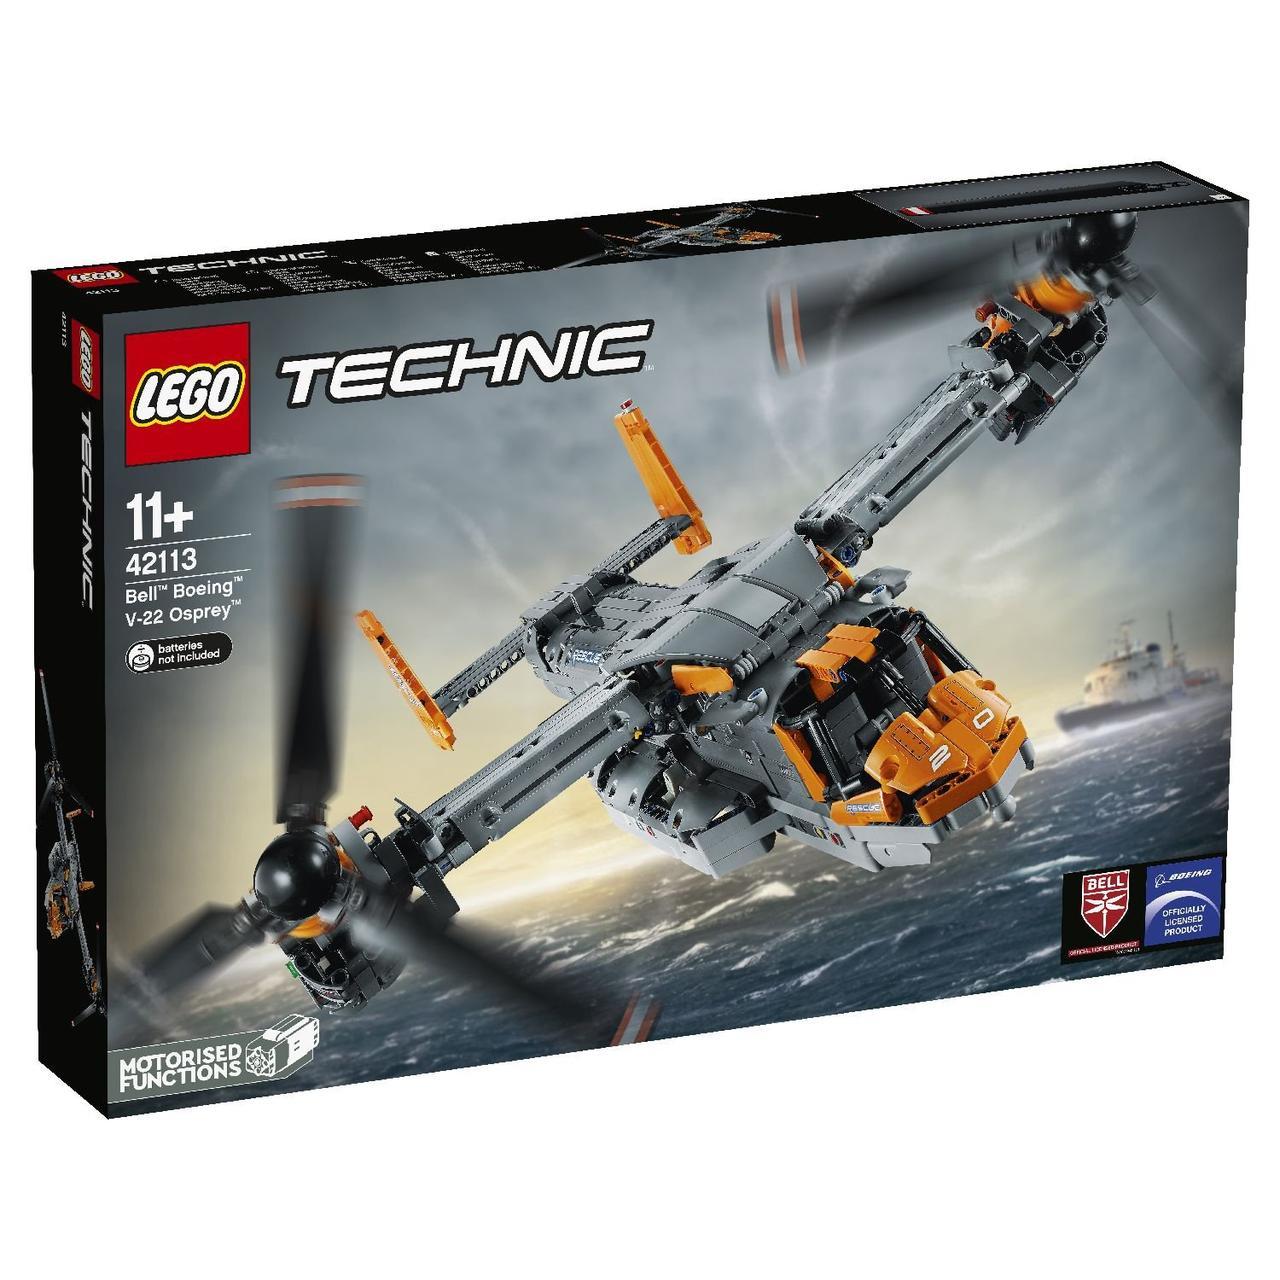 42113 Lego Technic Конвертоплан Bell-Boeing V-22 Osprey, Лего Техник